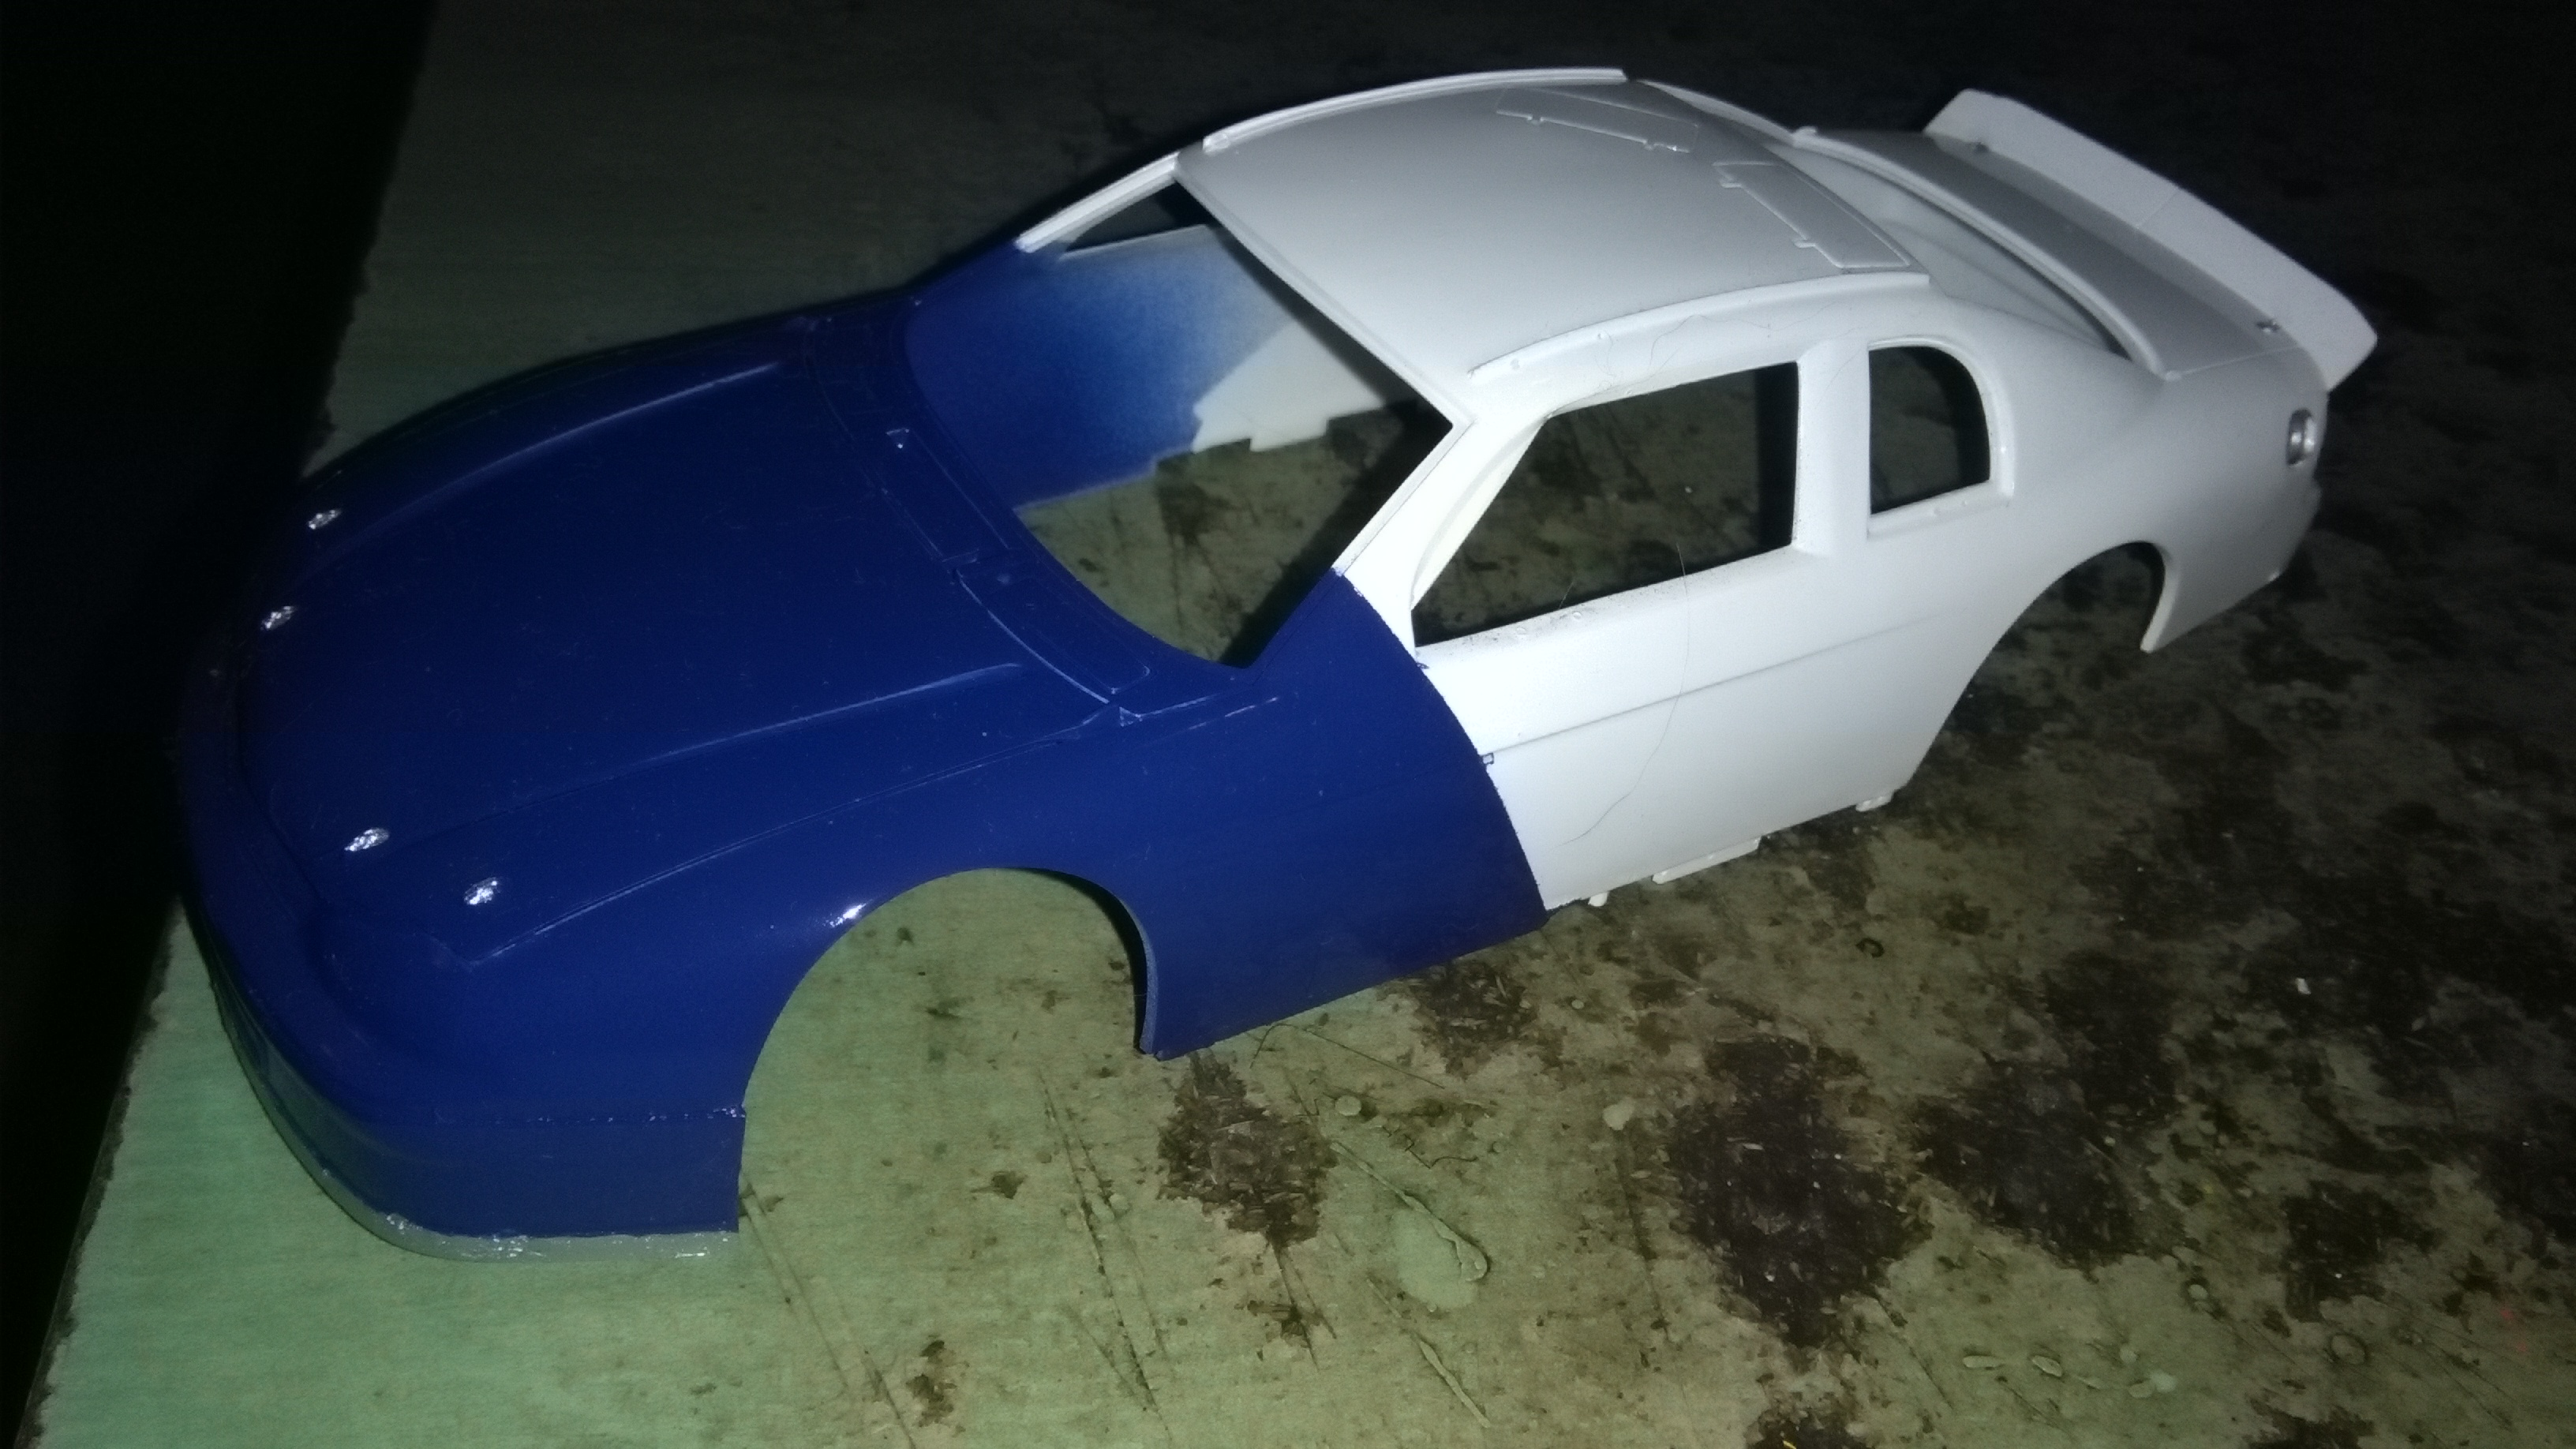 Chevy Monte-Carlo 1998 #32 Jeff Green Kleenex-Cottonelle   412740IMG20160122213423